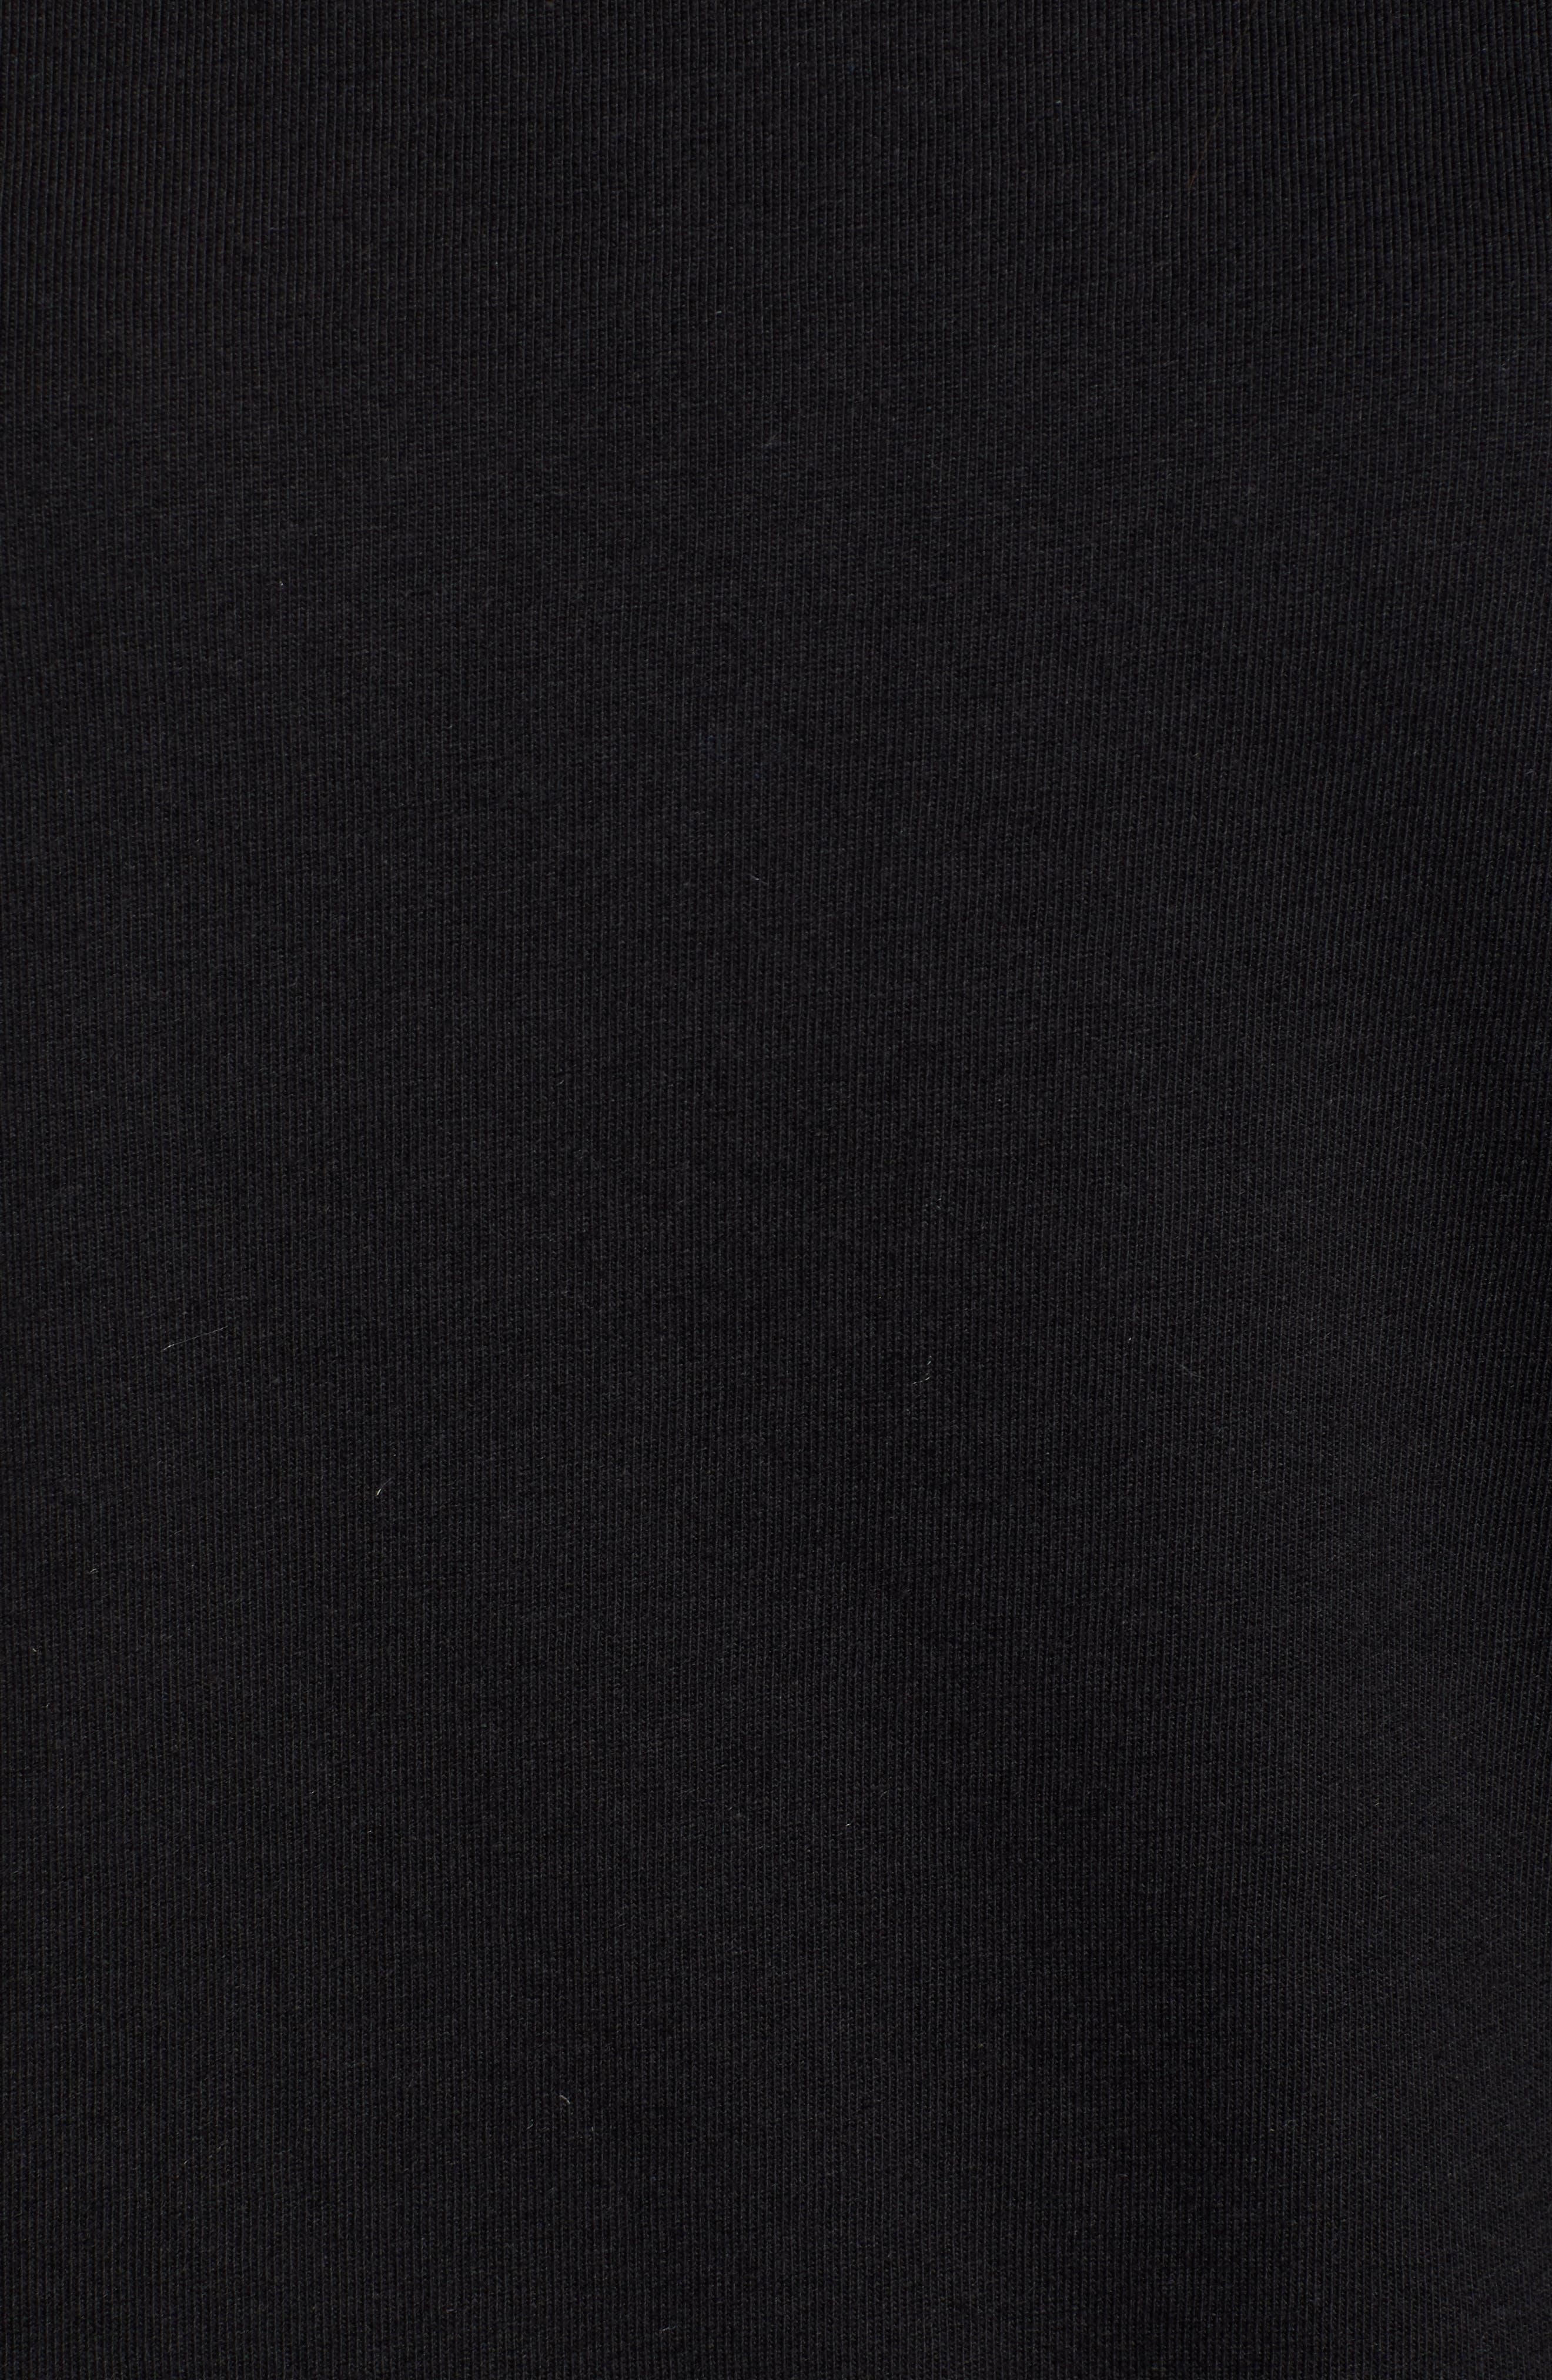 Blouson Sleeve Tee,                             Alternate thumbnail 5, color,                             BLACK